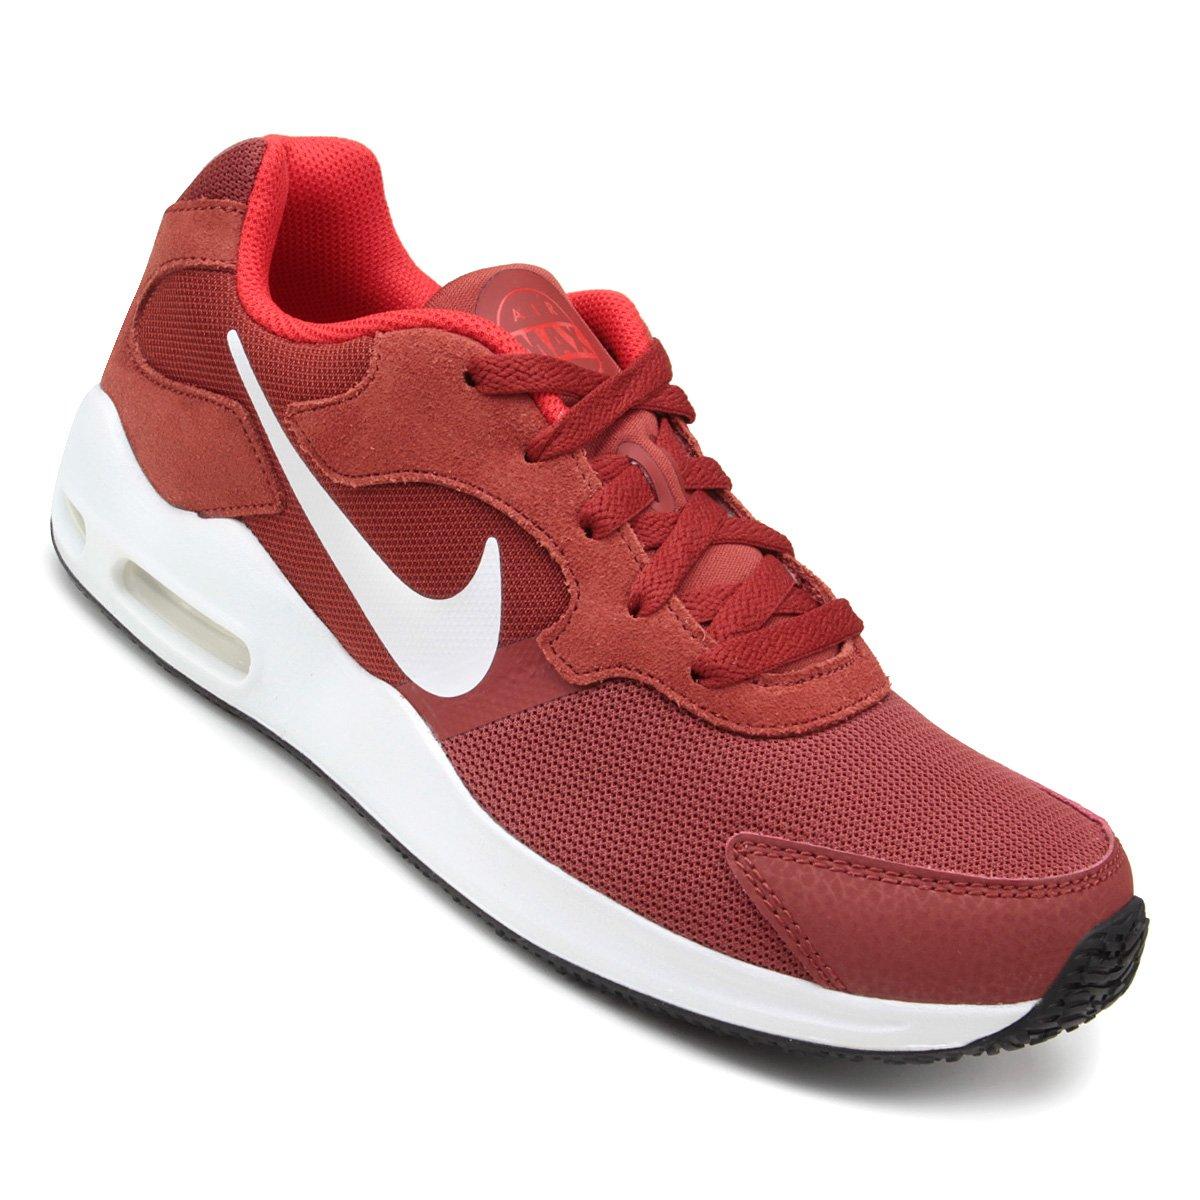 dc2a9ee16a6c4 Tênis Nike Air Max Guile Masculino - Vermelho Escuro - Compre Agora ...